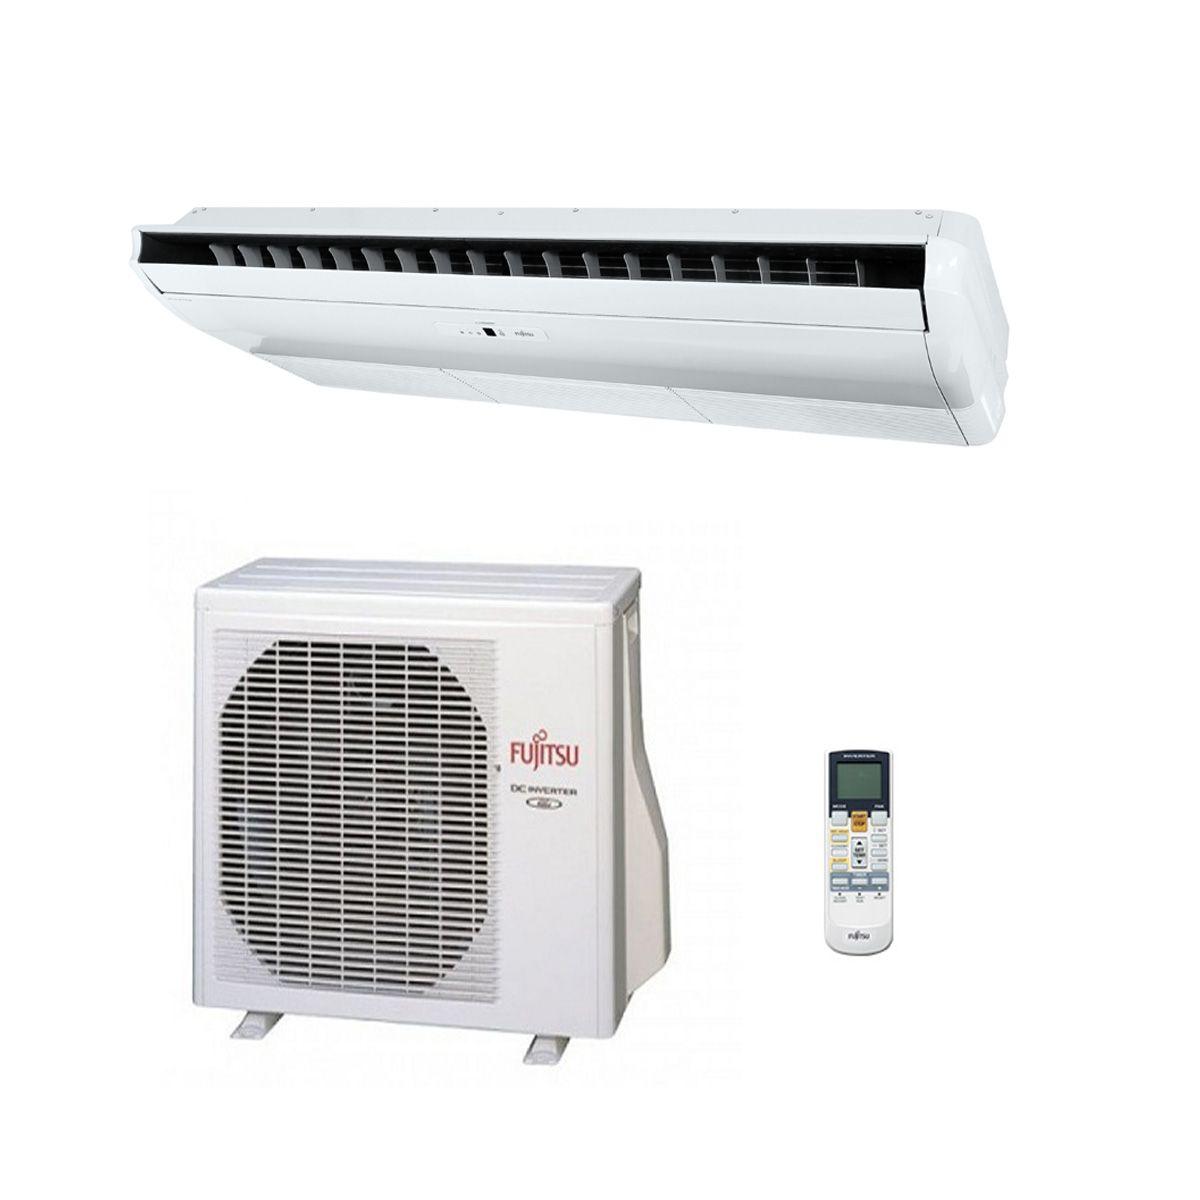 mitsubishi slimline air conditioner manual